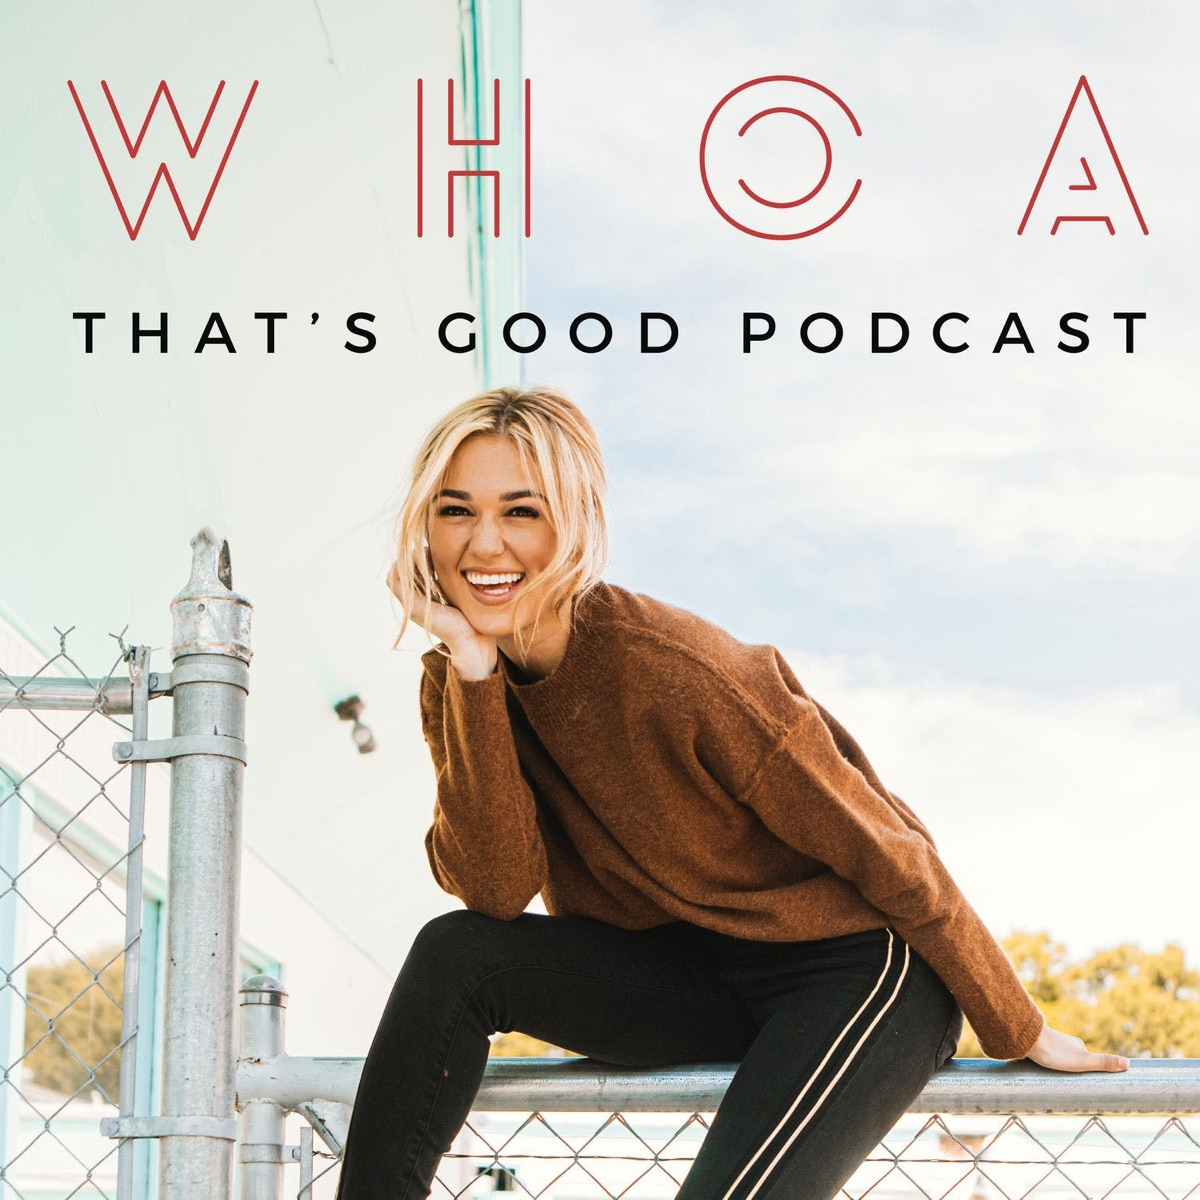 WHOA That's Good Podcast